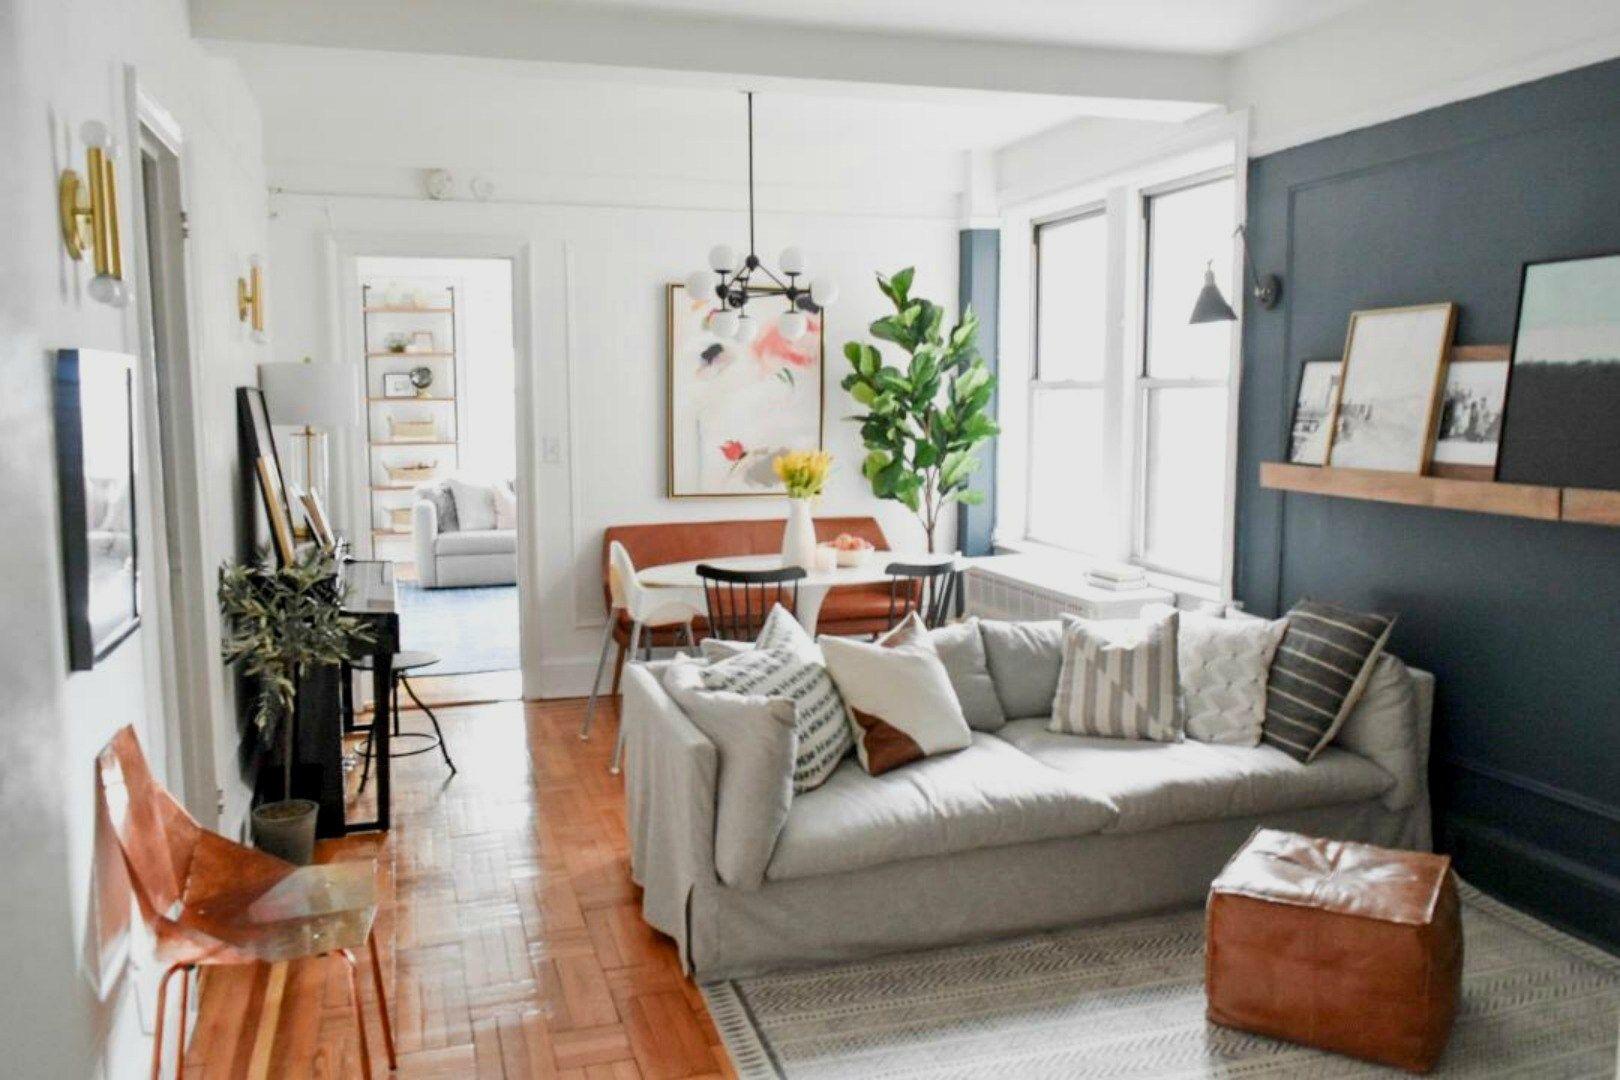 Best Of Apartment Design Small Spaces Small Apartment Interior